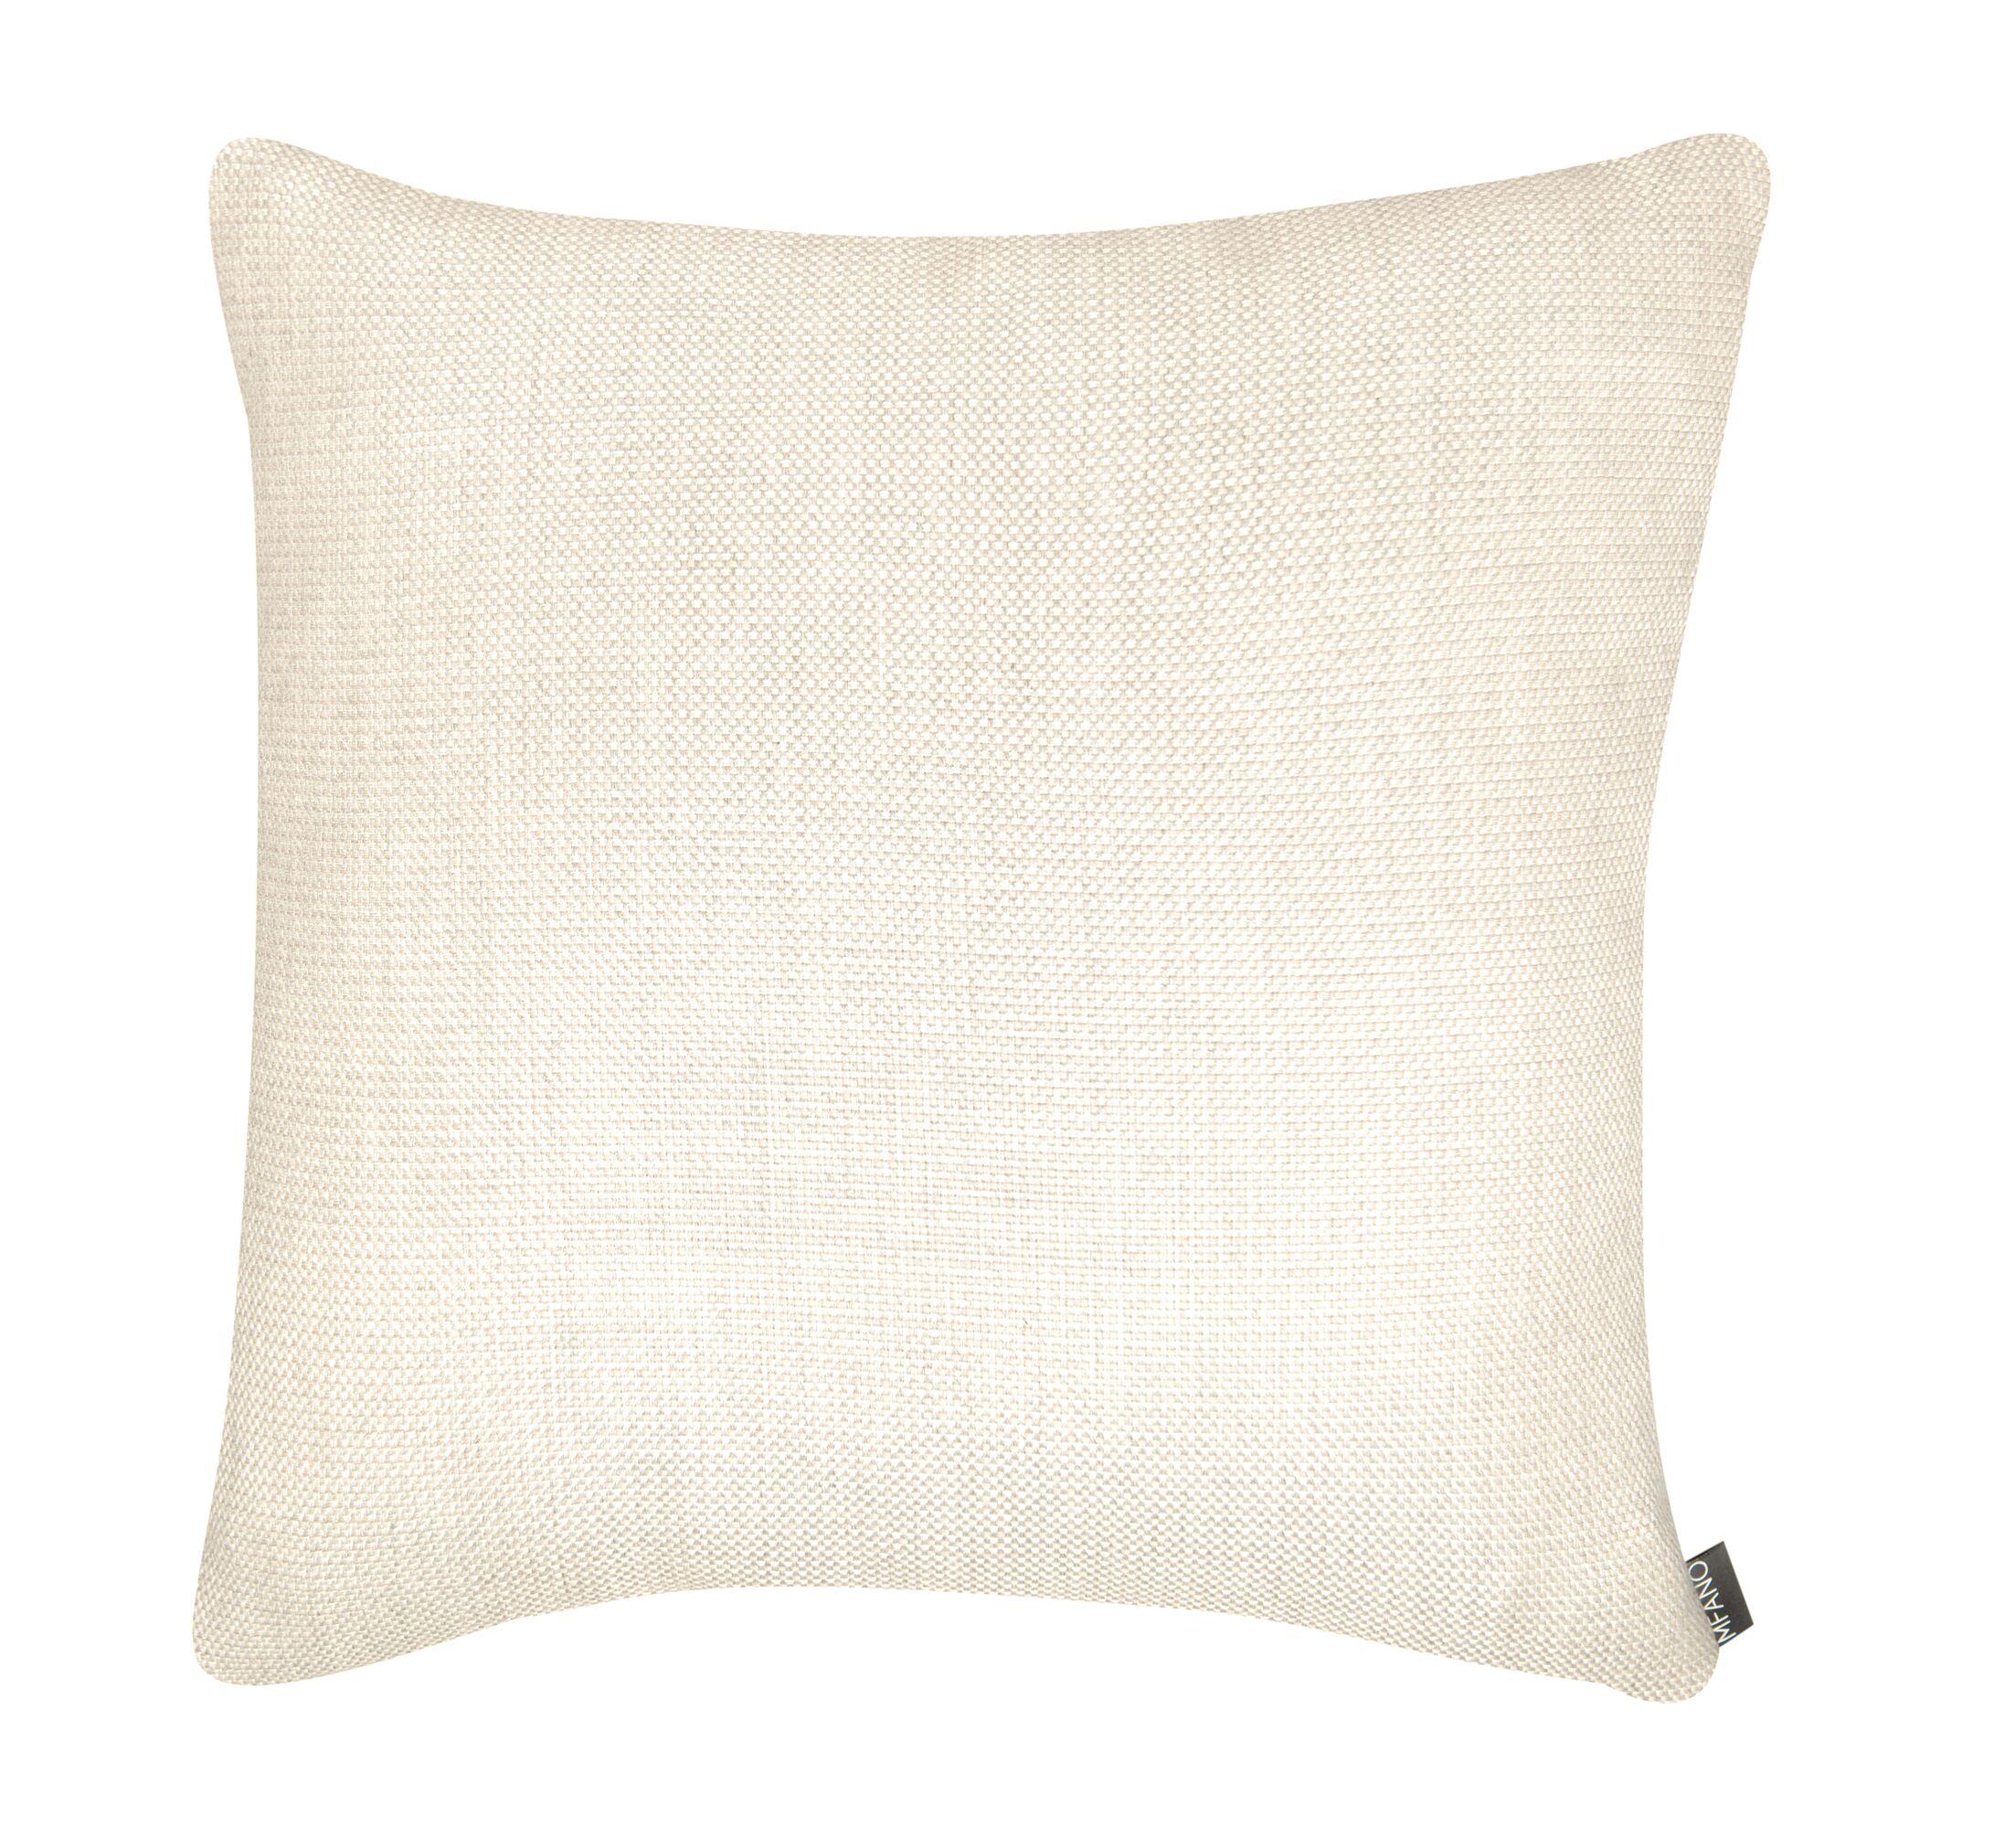 Décor Alyssa Luvs Indoor/Outdoor Throw Pillow Color: Sand Dollar, Size: 24